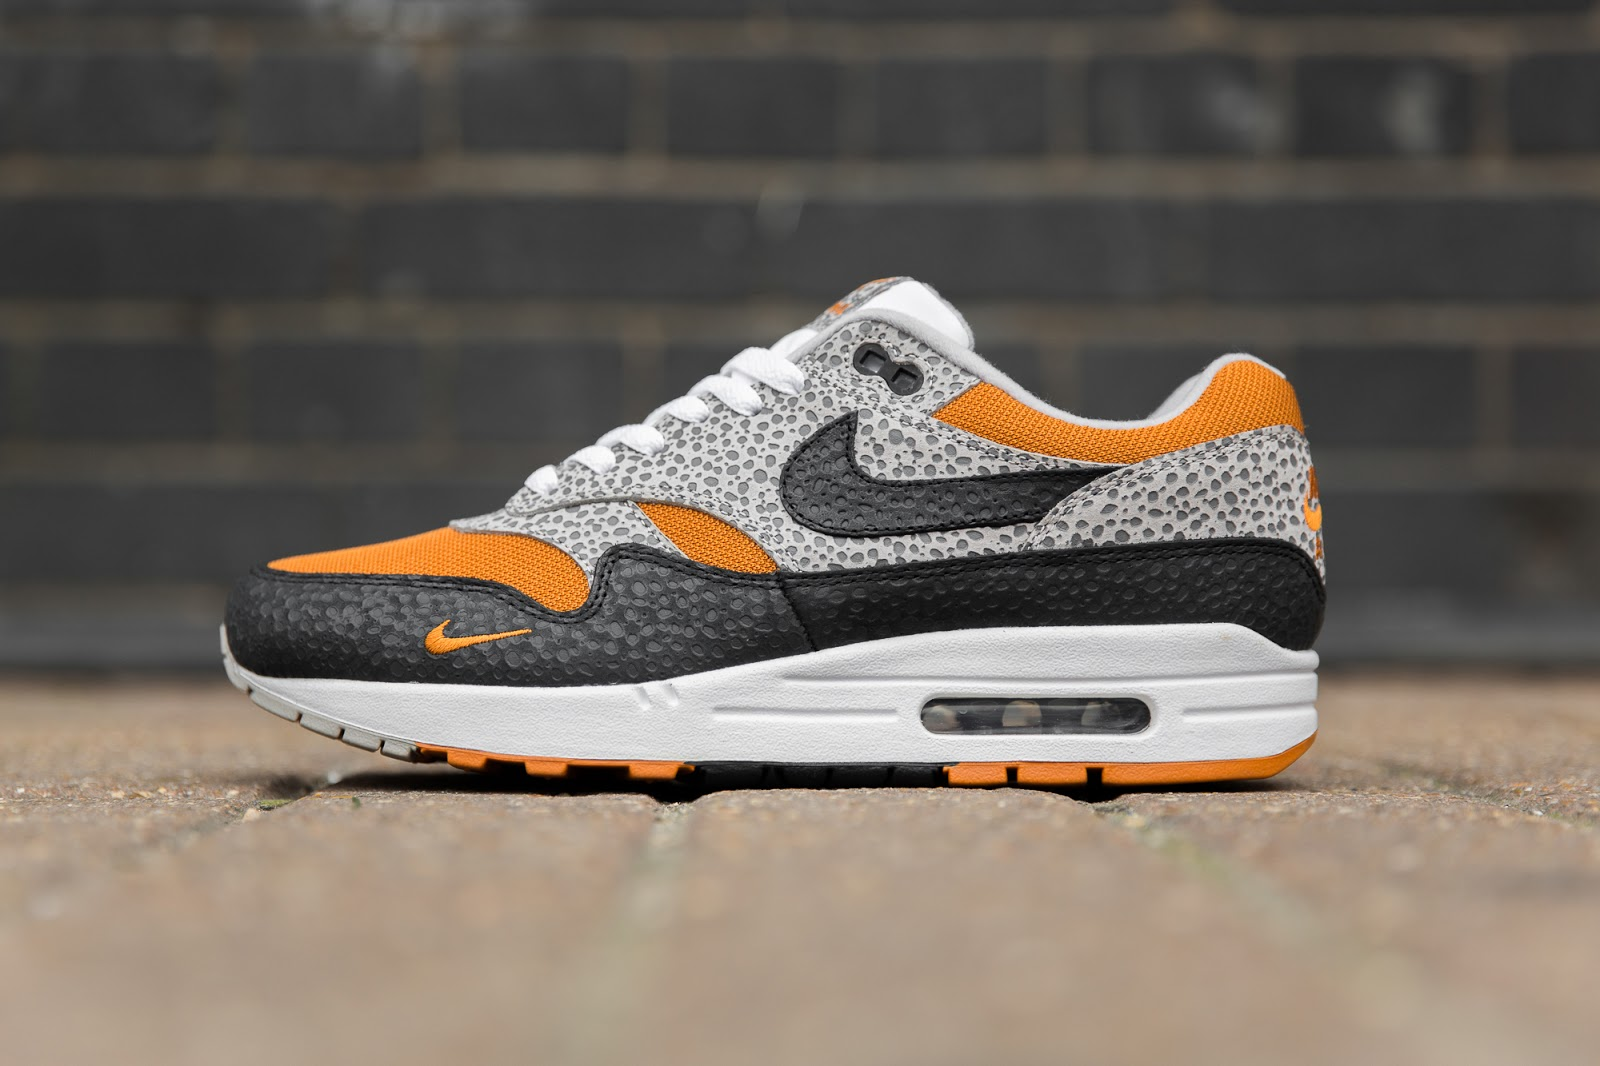 premium selection 21b26 2508a Sneaker Hype – size? Exclusive Nike Air Max 1 'Safari ...